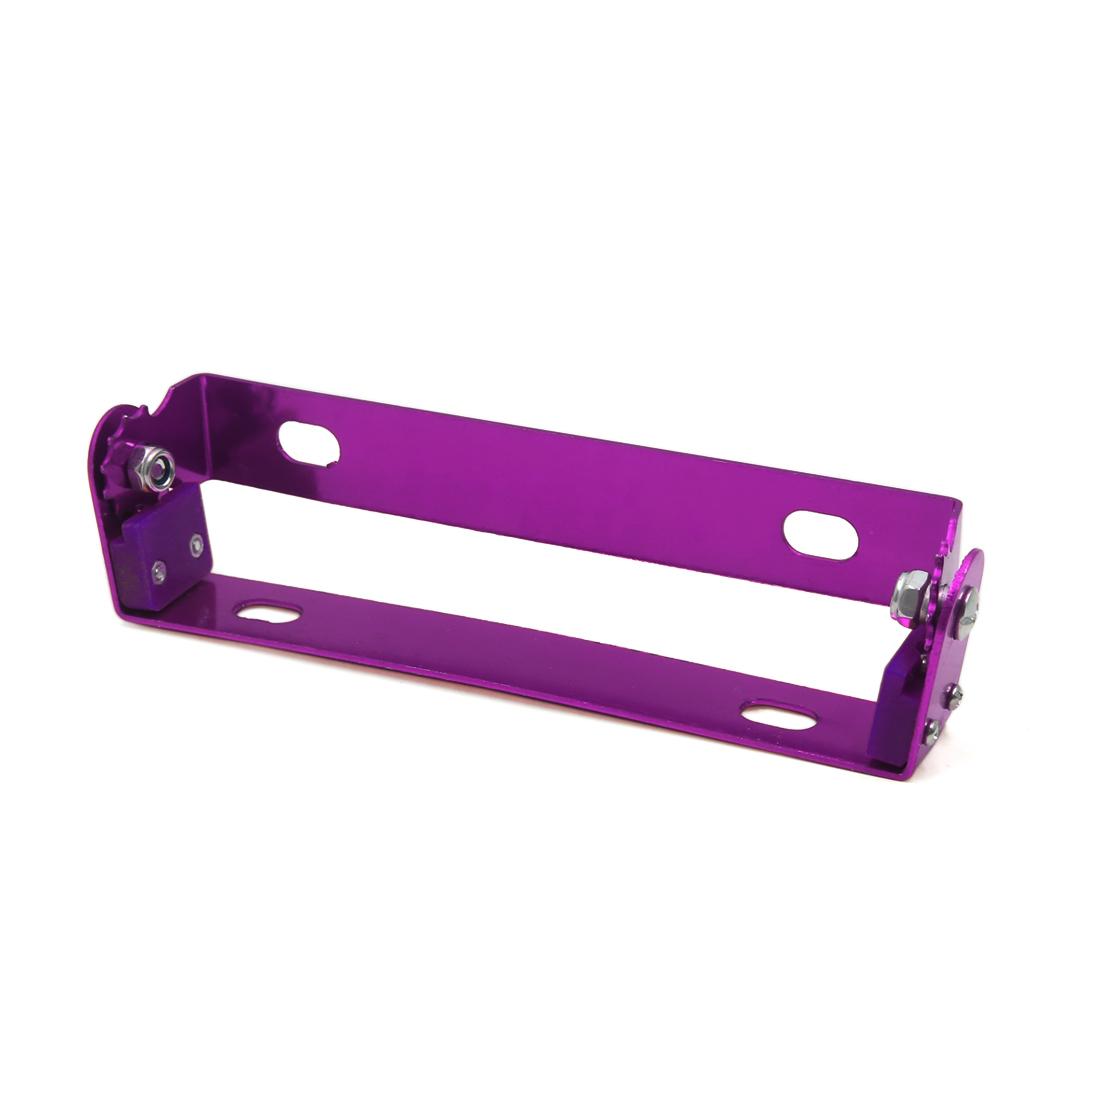 Purple Aluminum Alloy Adjustable Motorcycle License Plate Mount Holder Bracket